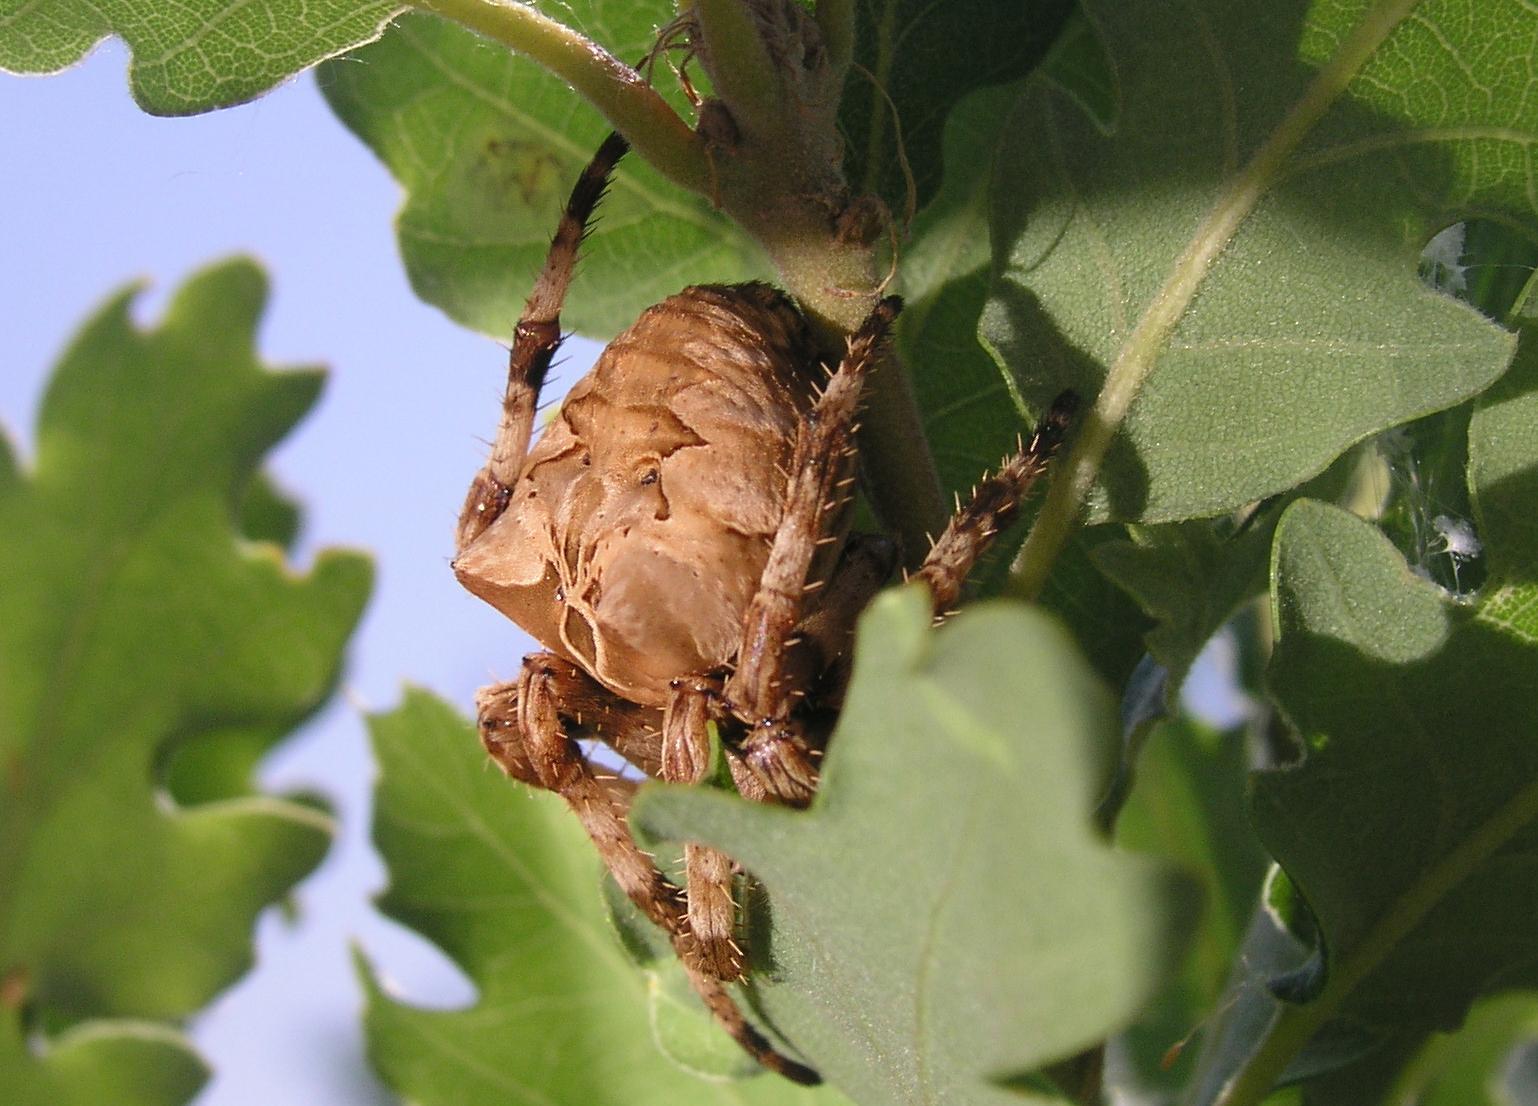 gömb alakú cserje parazita)